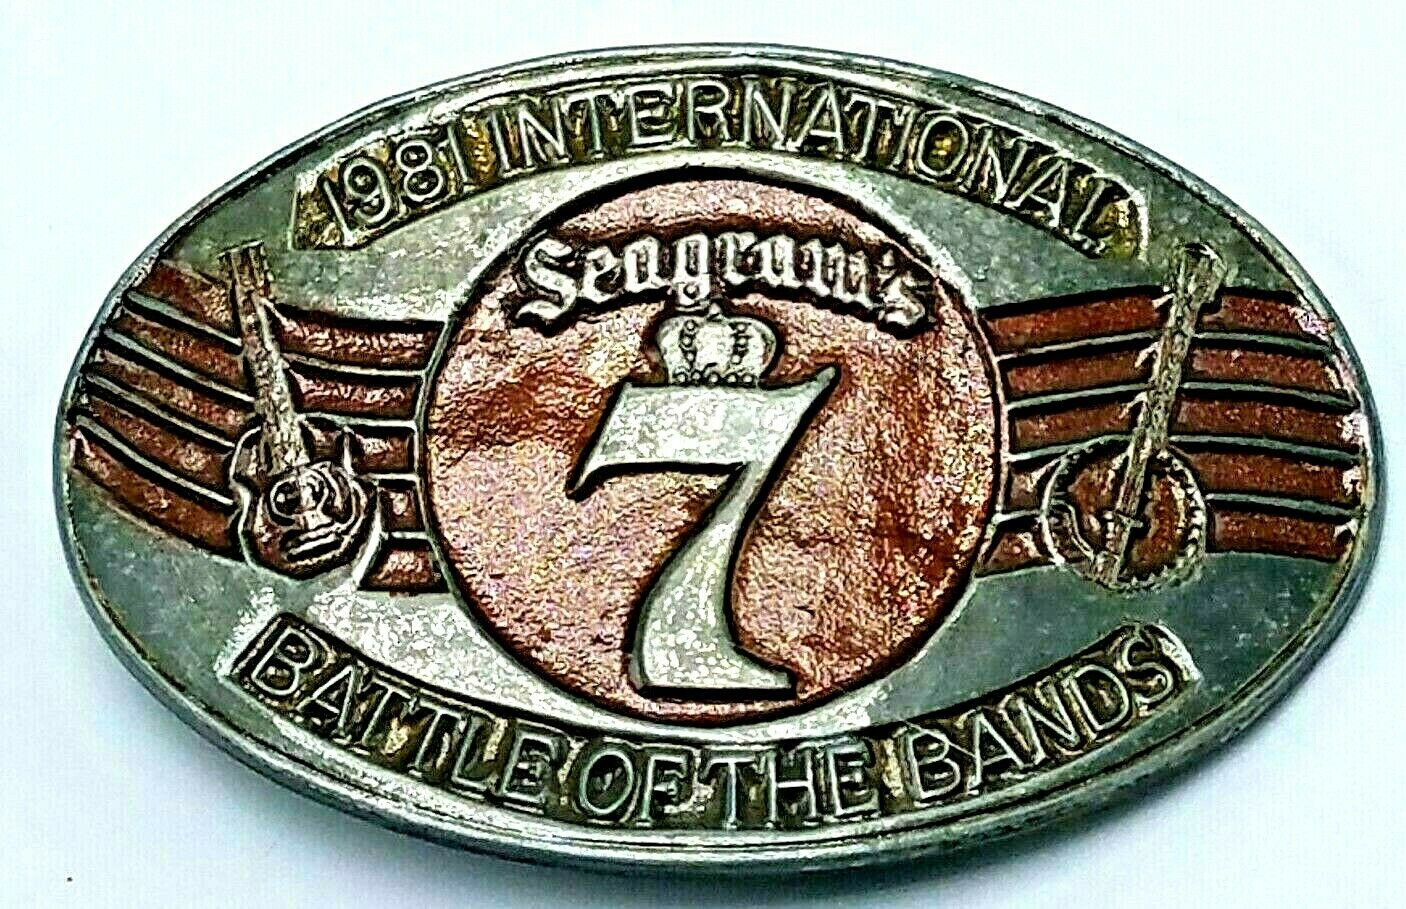 Vintage 1981 Seagams 7 Battle of the Bands Belt Buckle RARE